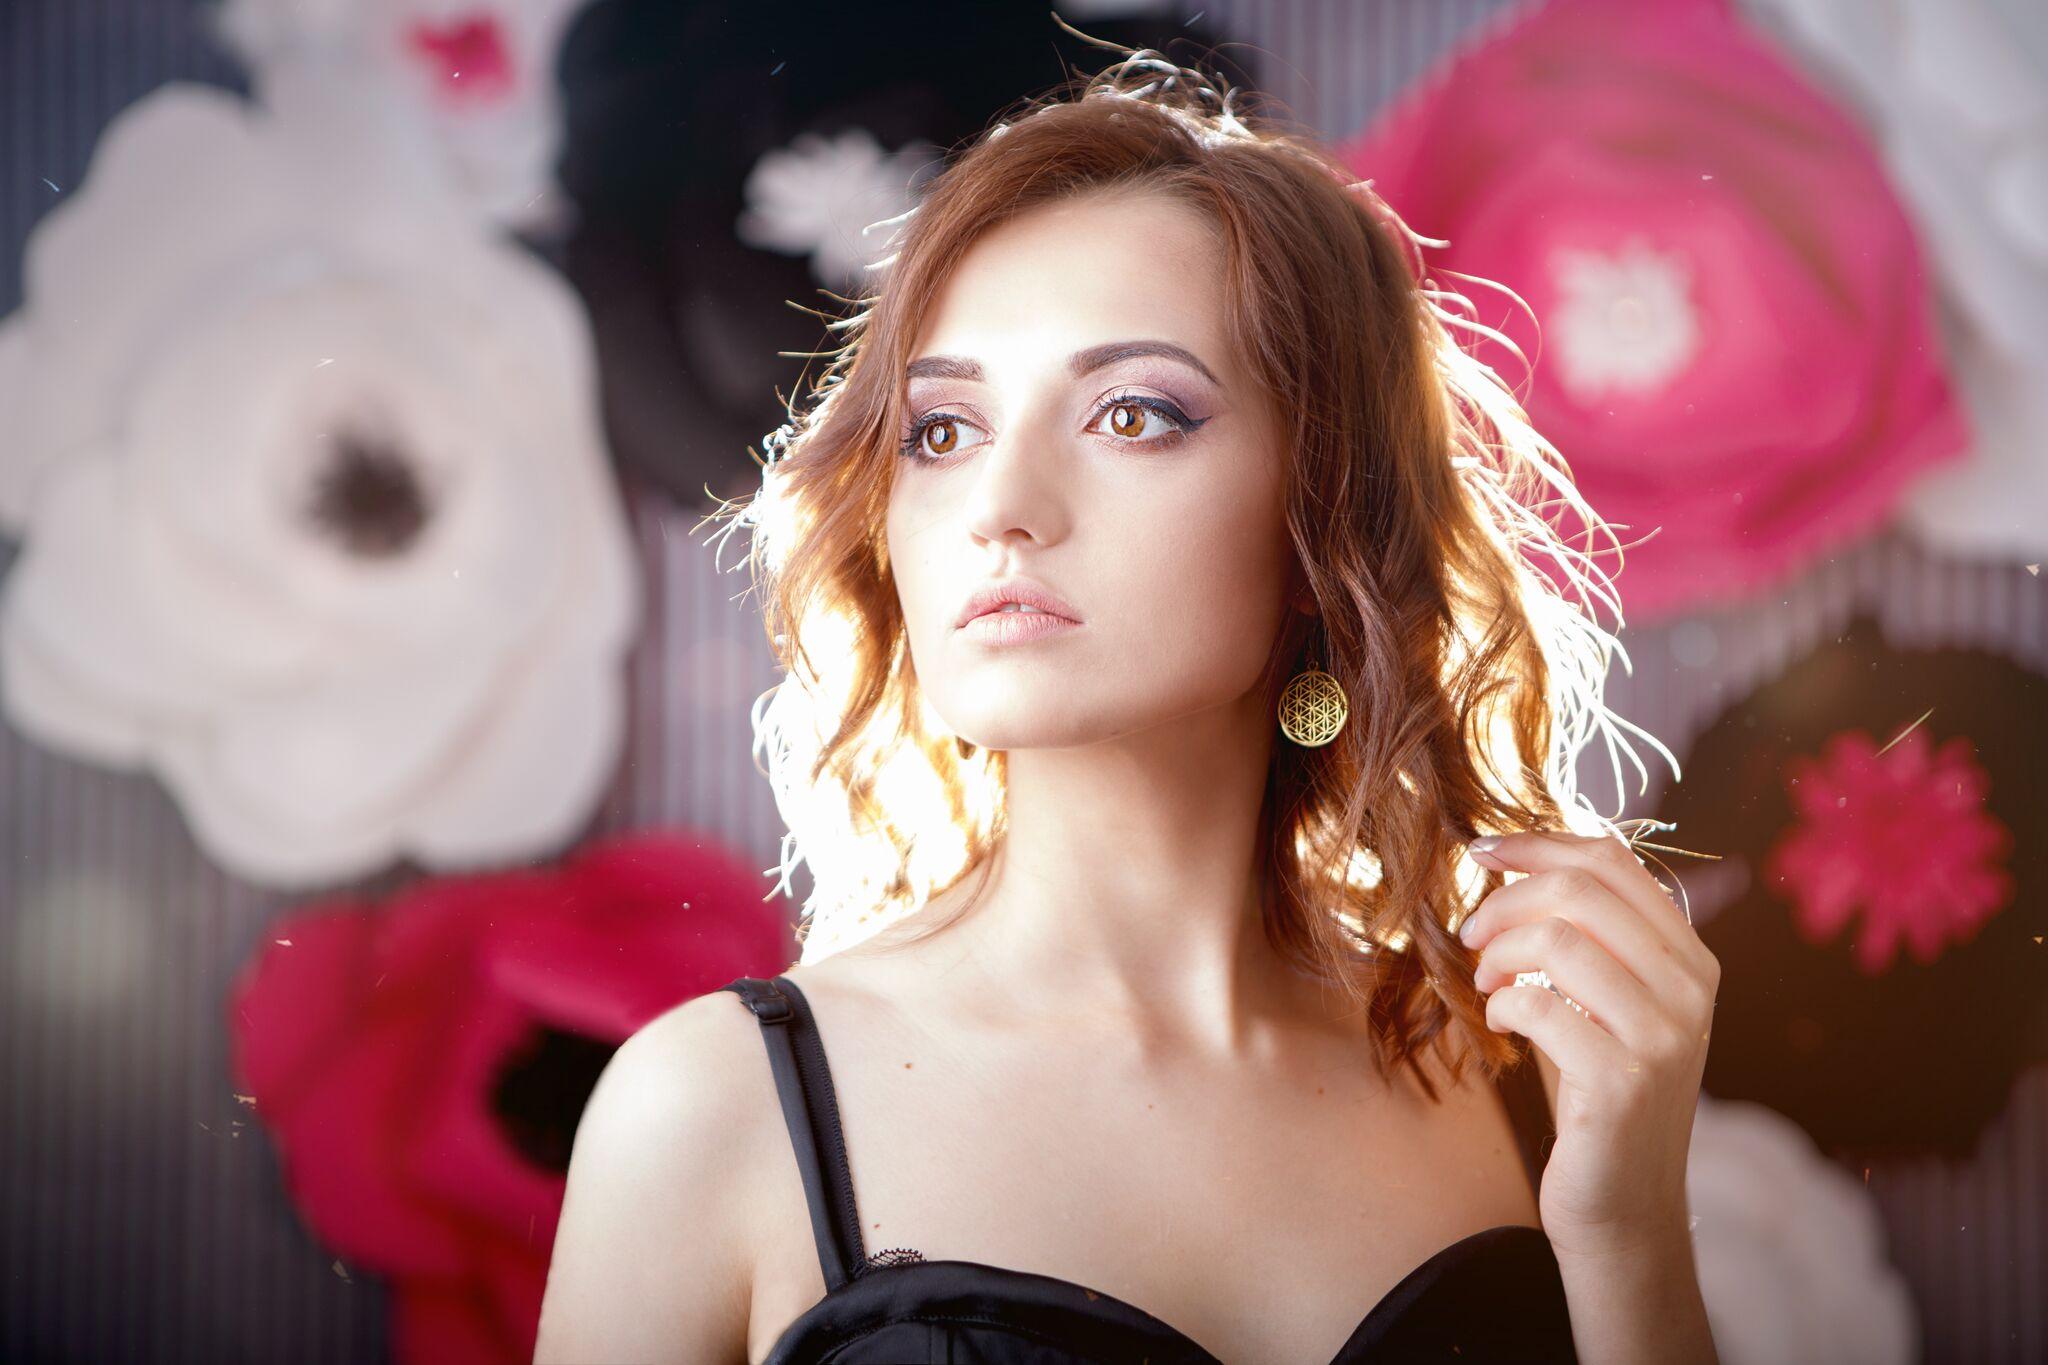 Юлия тимонина фото